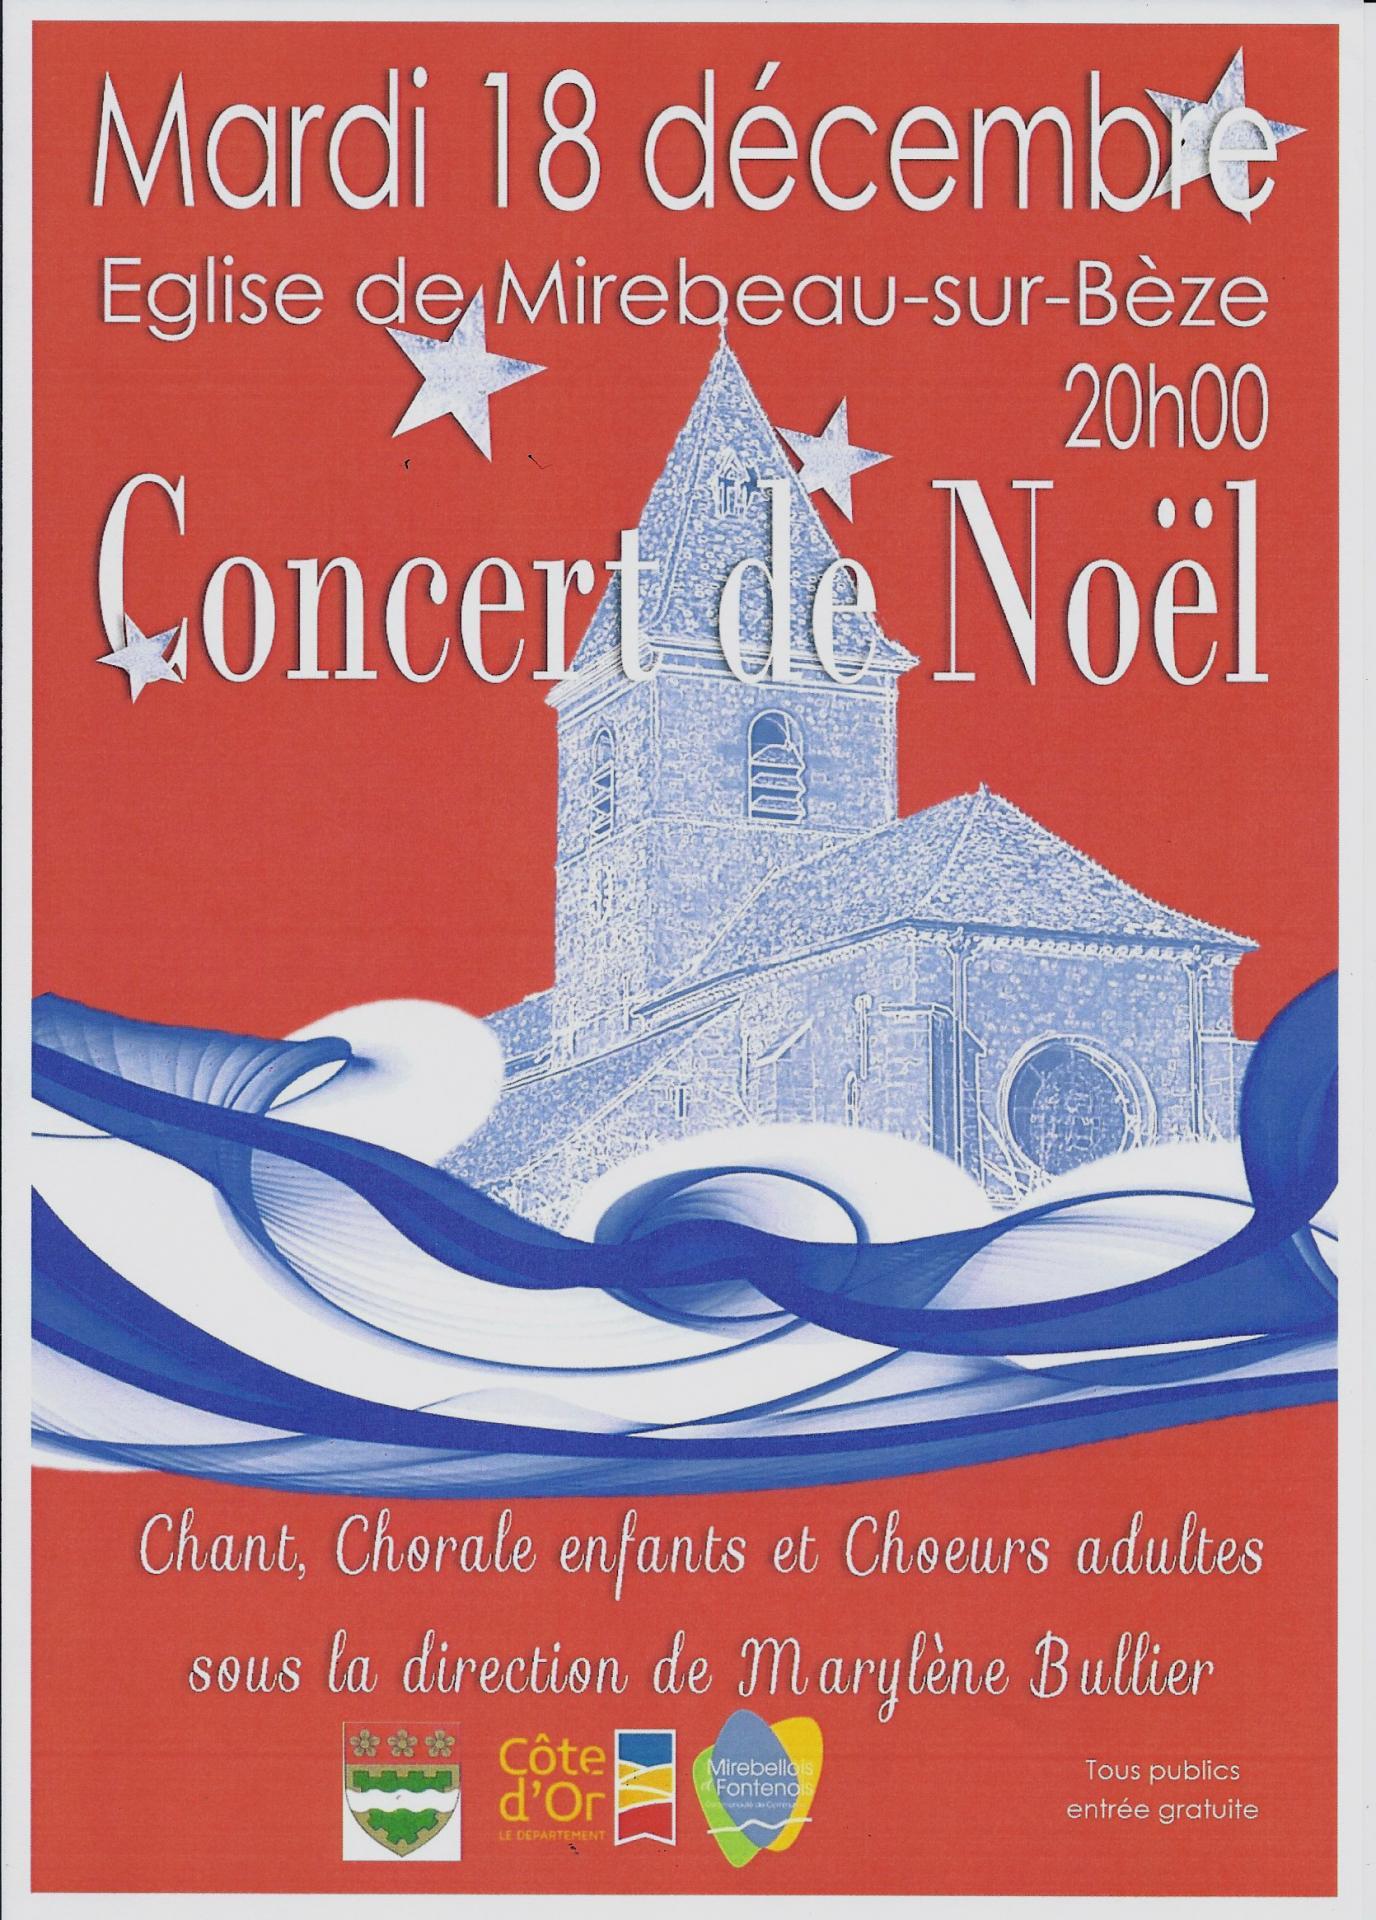 Affiche concert noel e3a 18 12 18